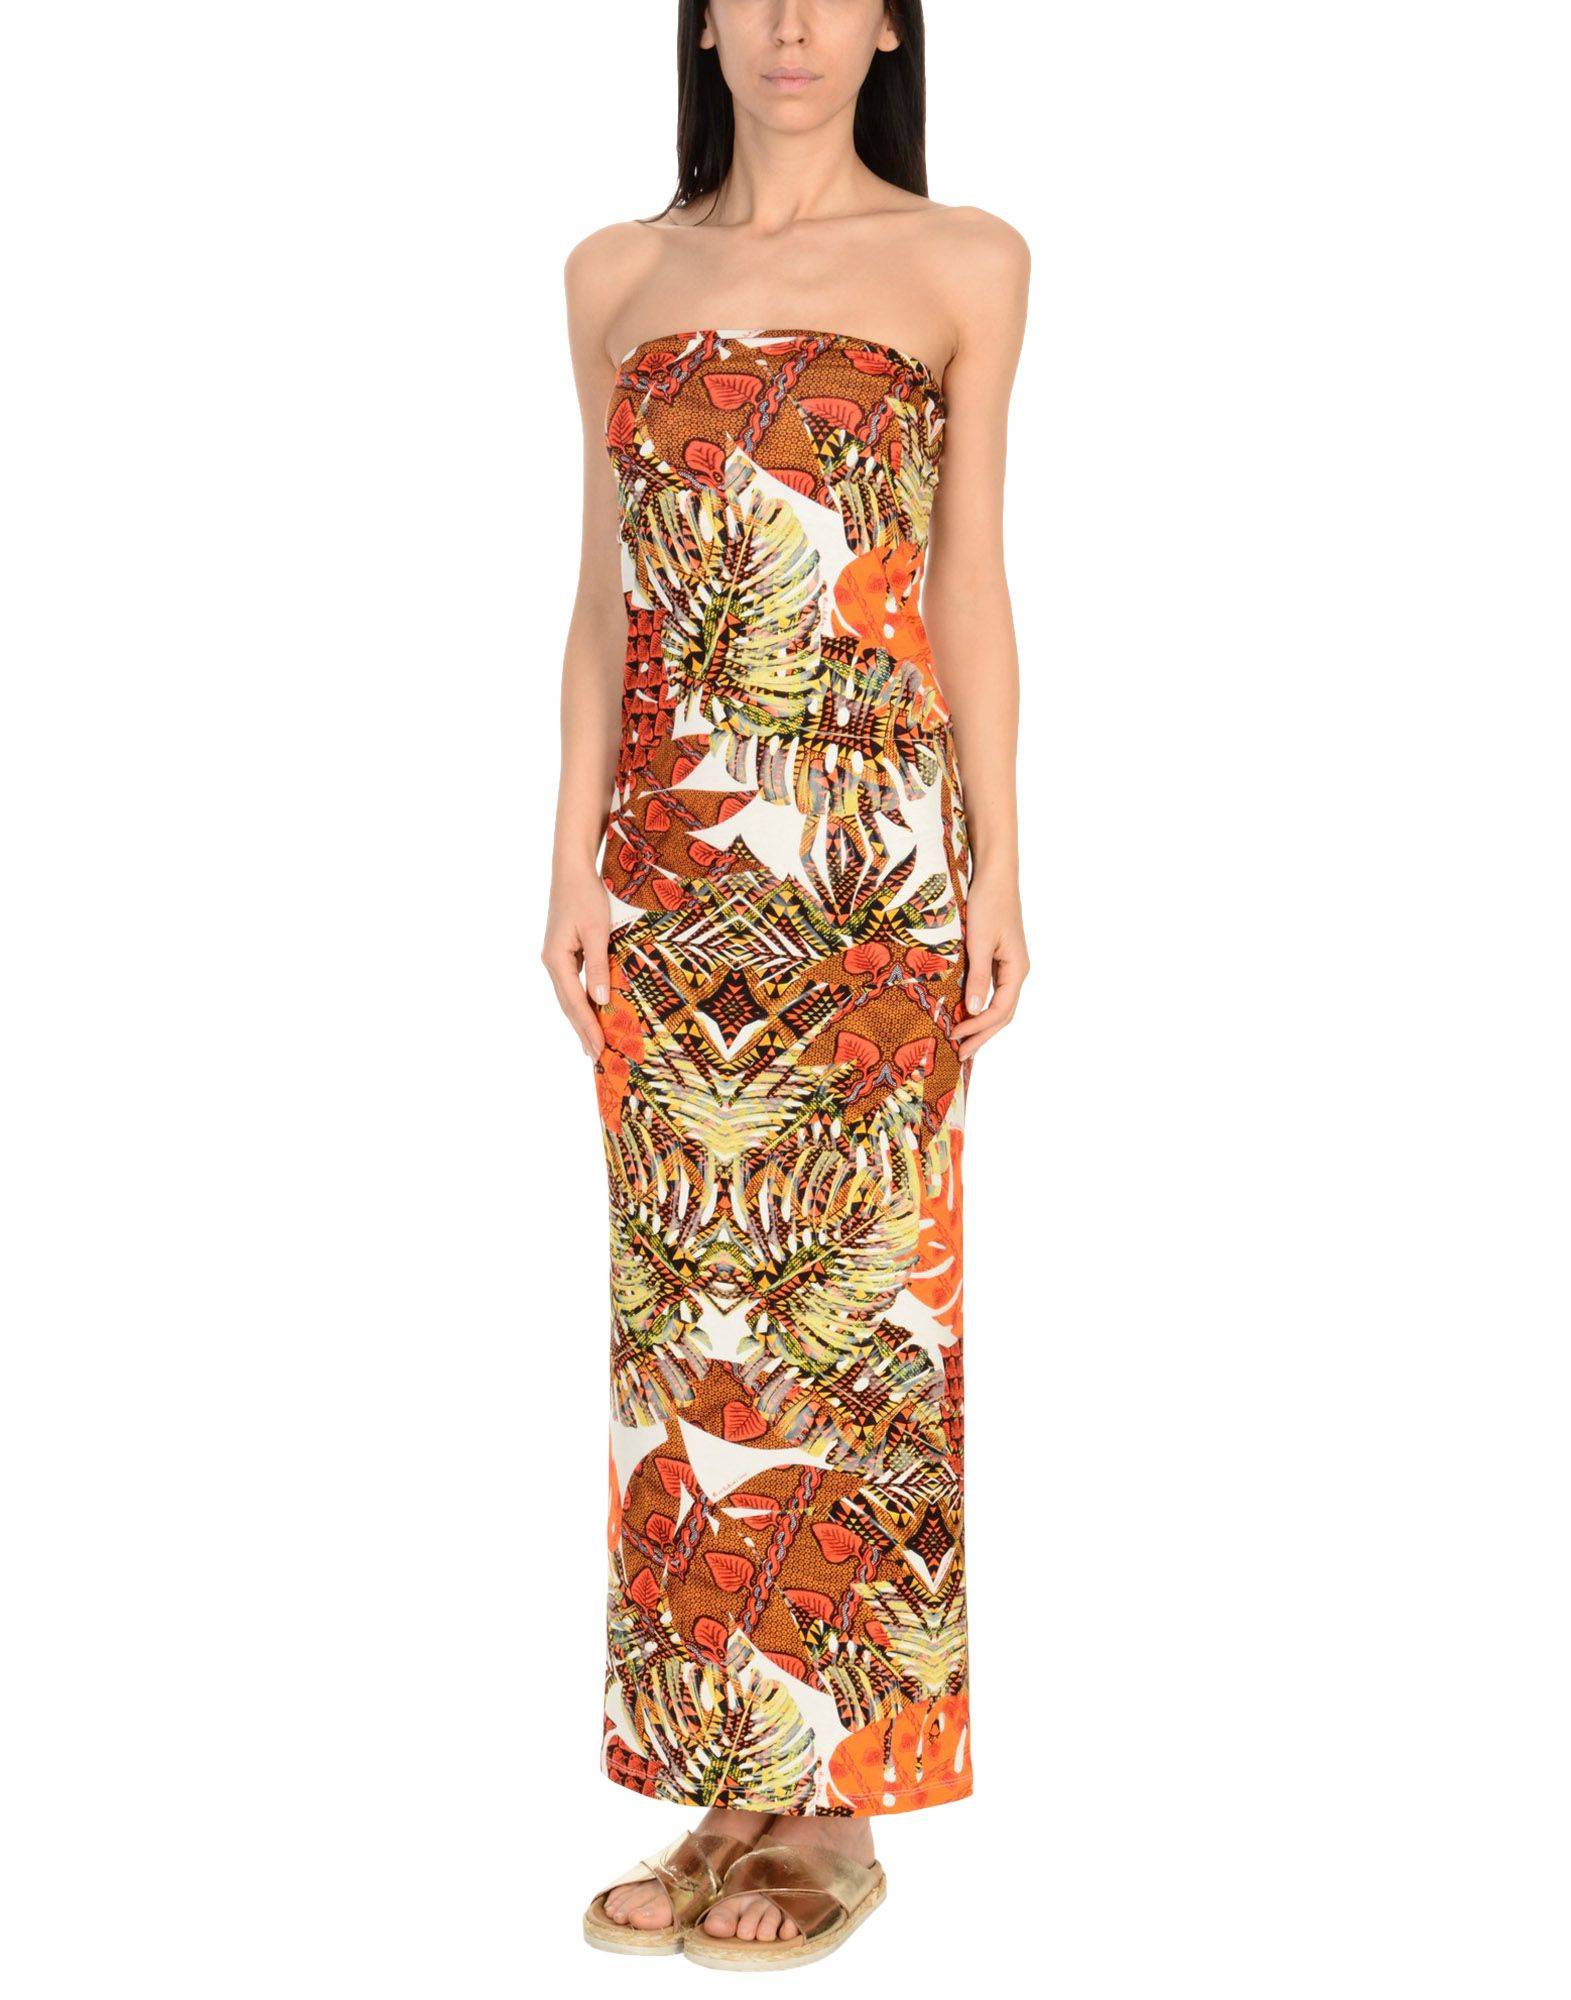 MISS BIKINI LUXE Пляжное платье padded bikini set